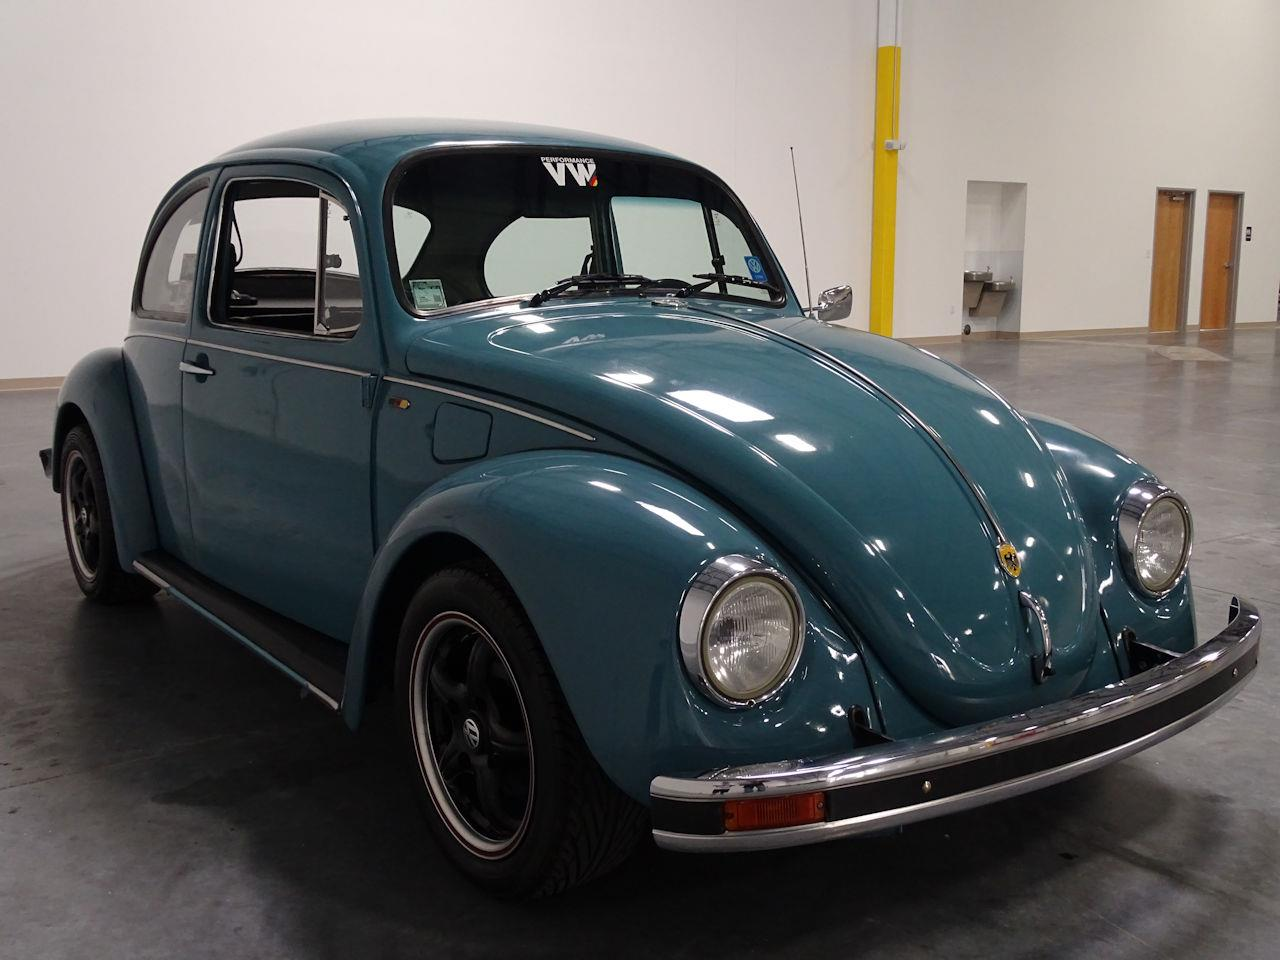 1990 Volkswagen Beetle For Sale Classiccars Com Cc 1008536